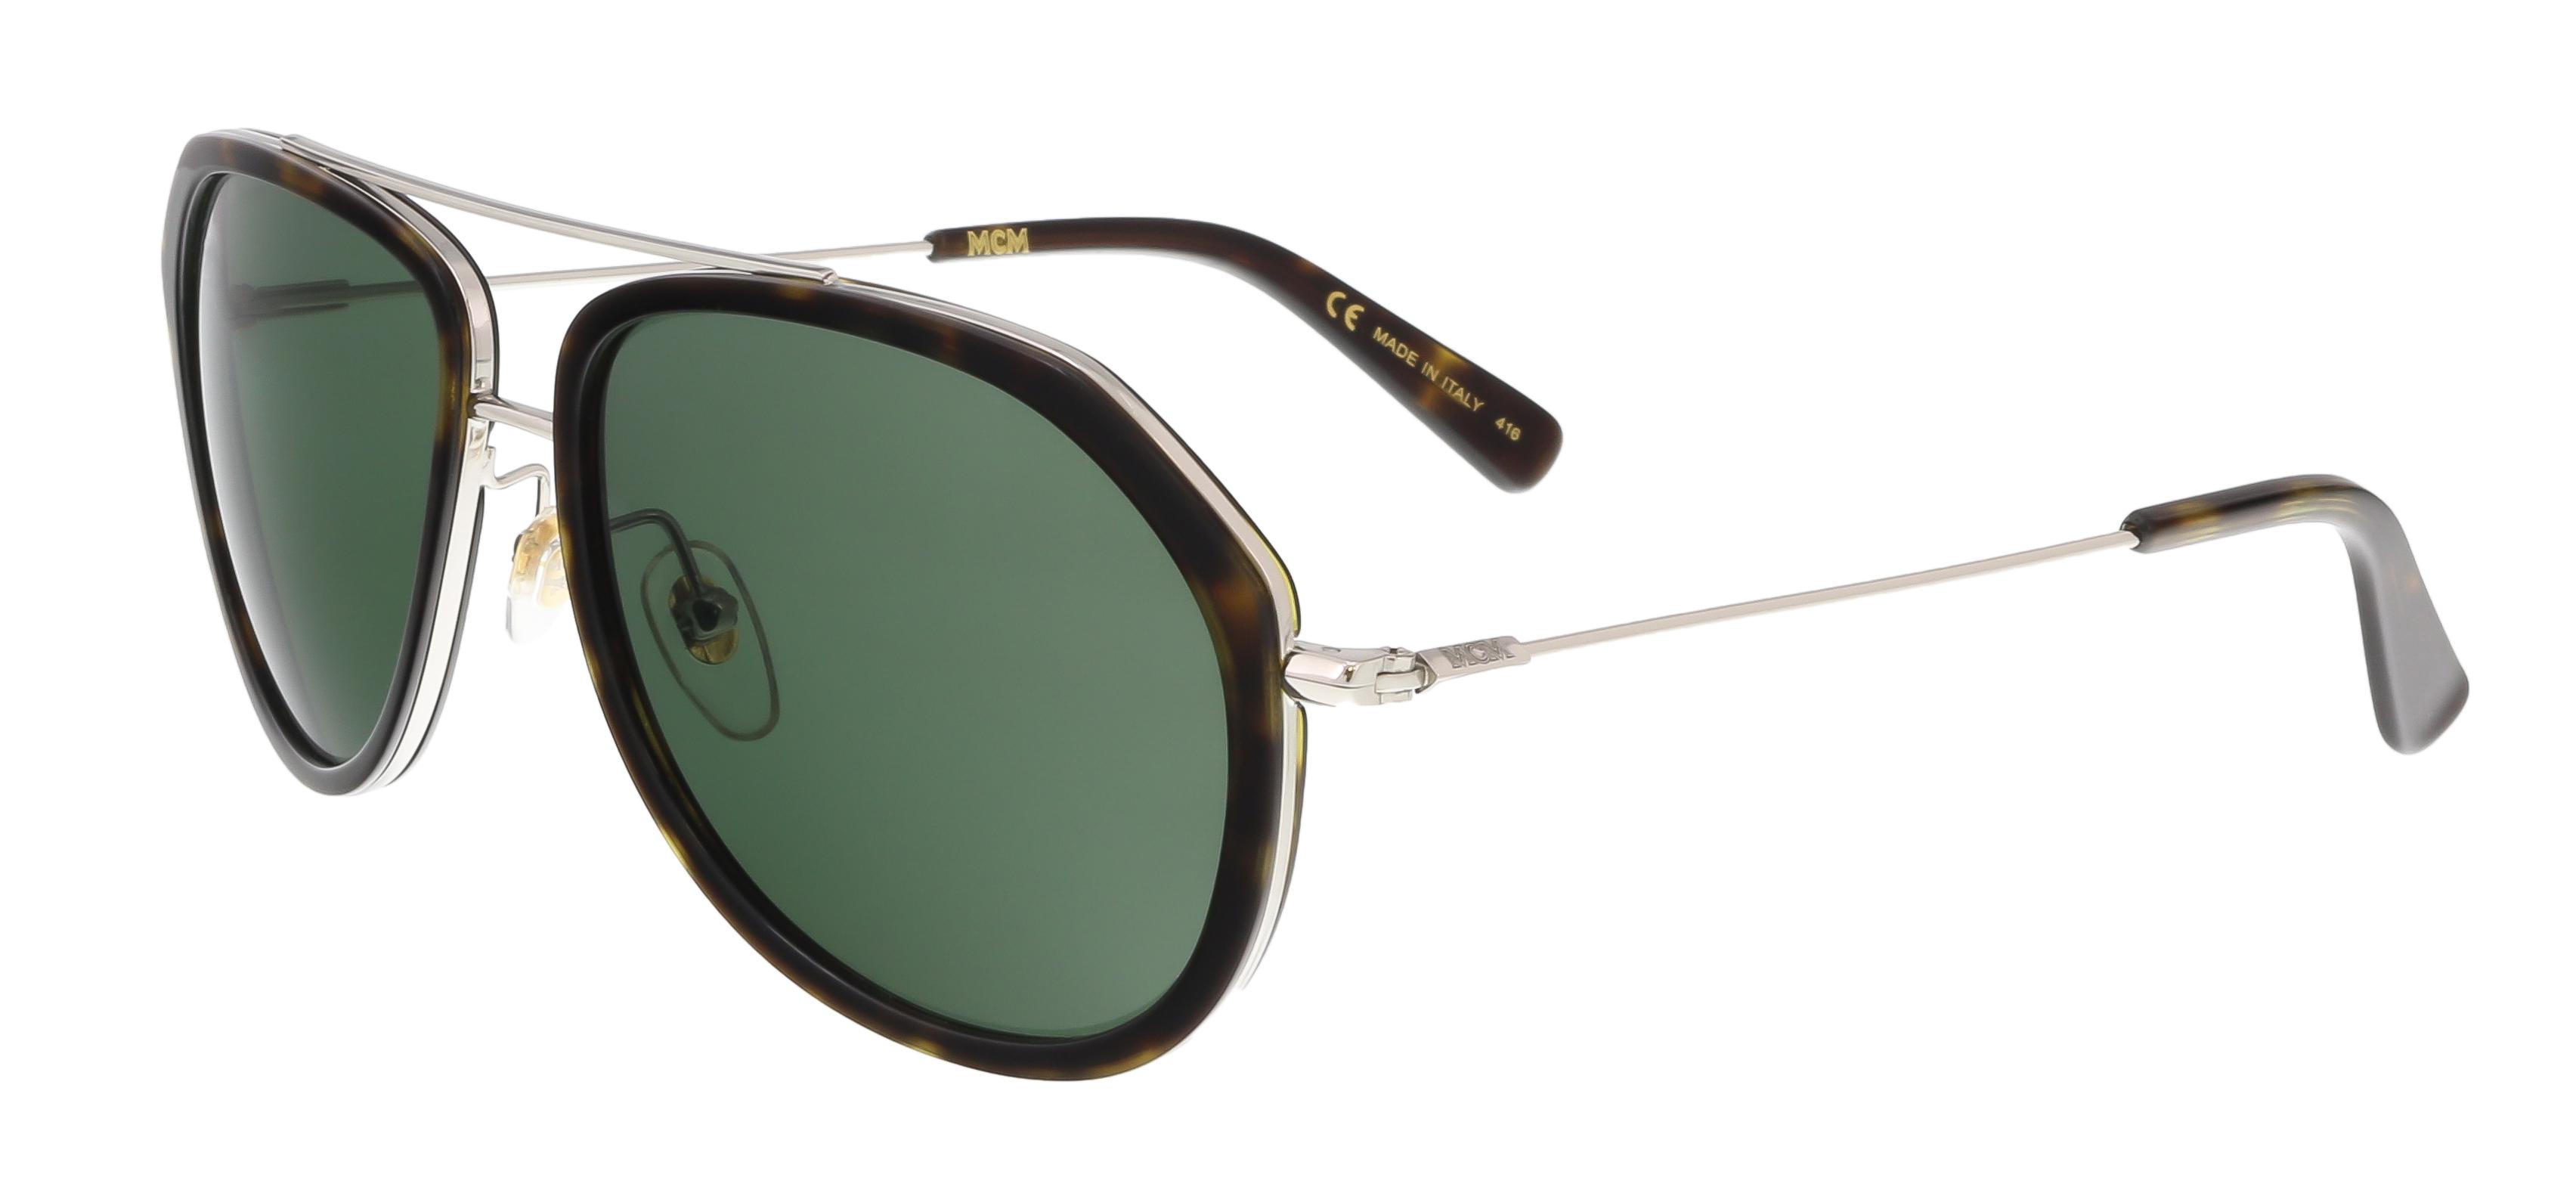 MCM613S 214 Havana Aviator Feline Sunglasses